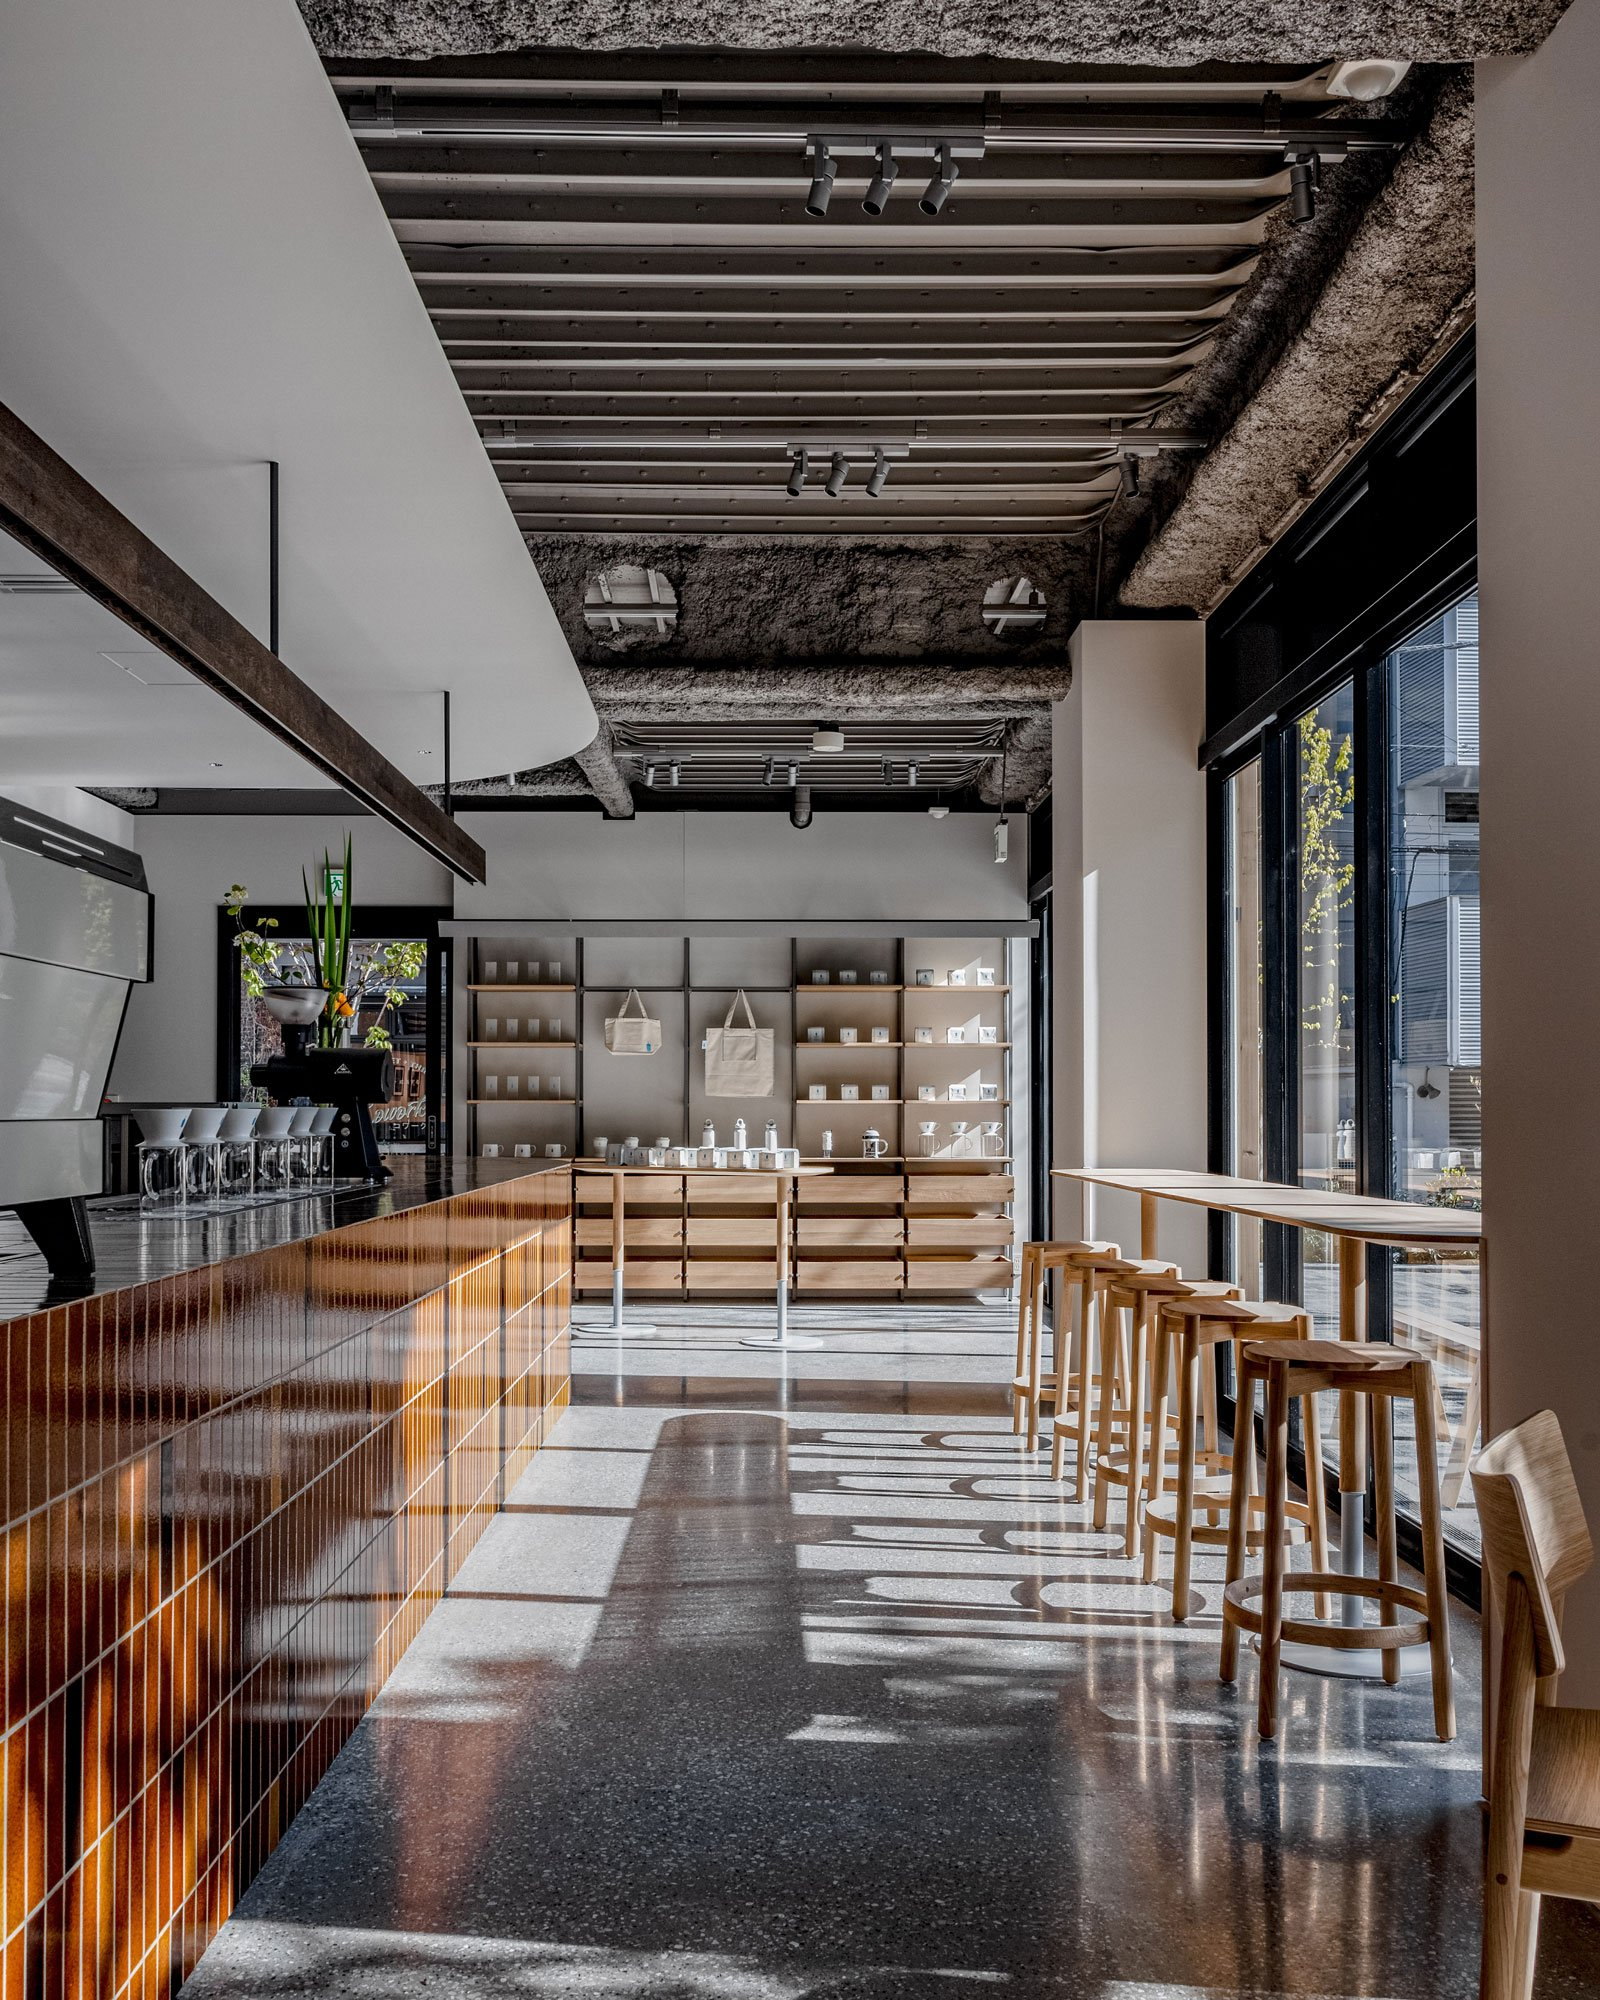 Der Blue Bottle Coffee Shop Shibuya von Keiji Ashizawa